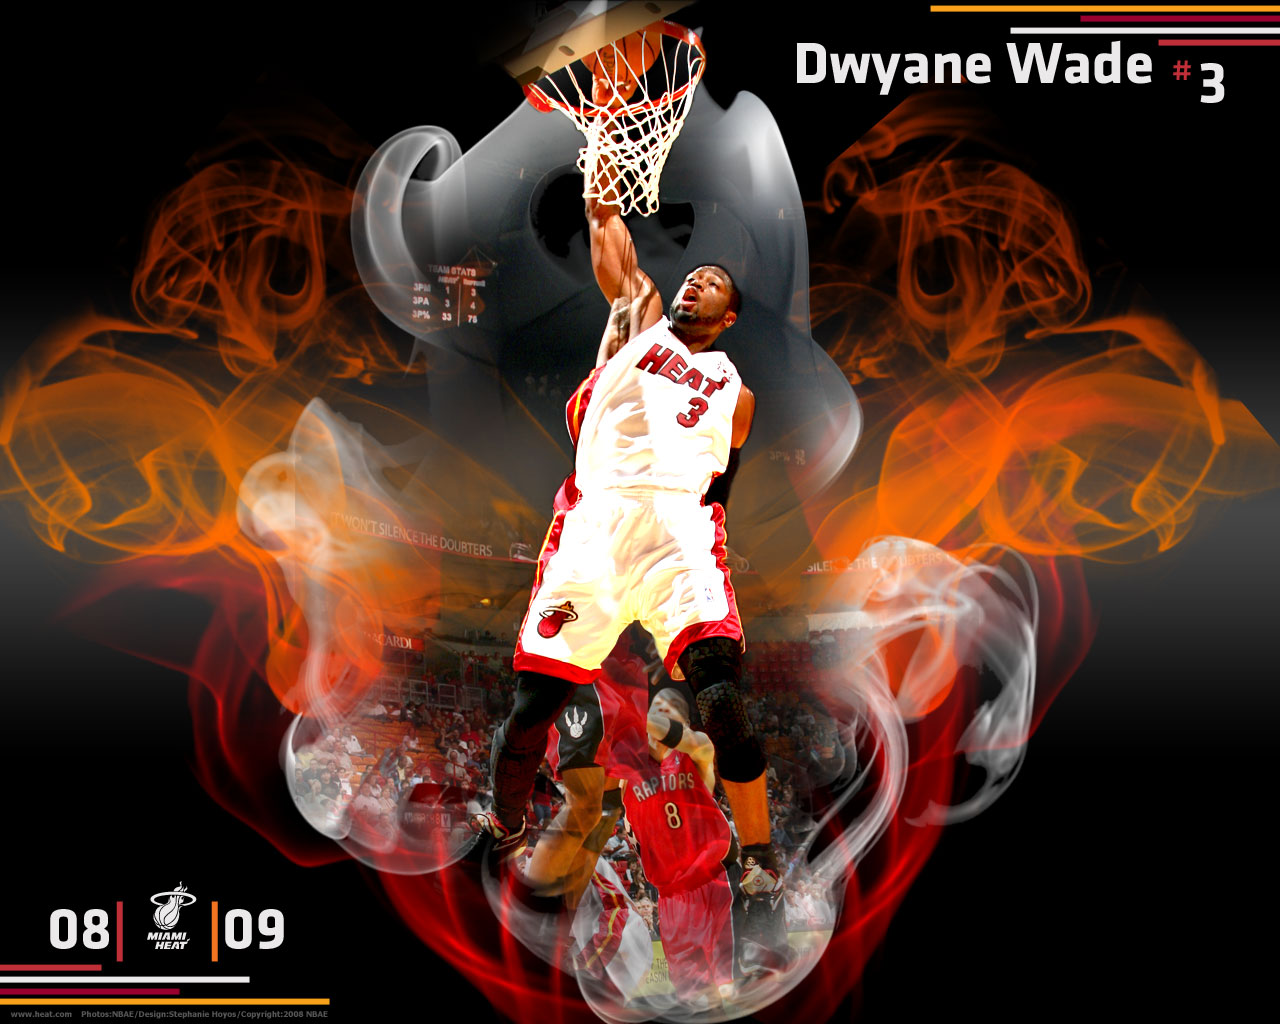 http://1.bp.blogspot.com/-KfRjsrWn3UU/TdnHCryn82I/AAAAAAAAAQo/6AkzB1xWpIw/s1600/Dwyane_Wade_Heart_Basketball_www.Wallpaper-garage.blogspot.com-797595.jpg